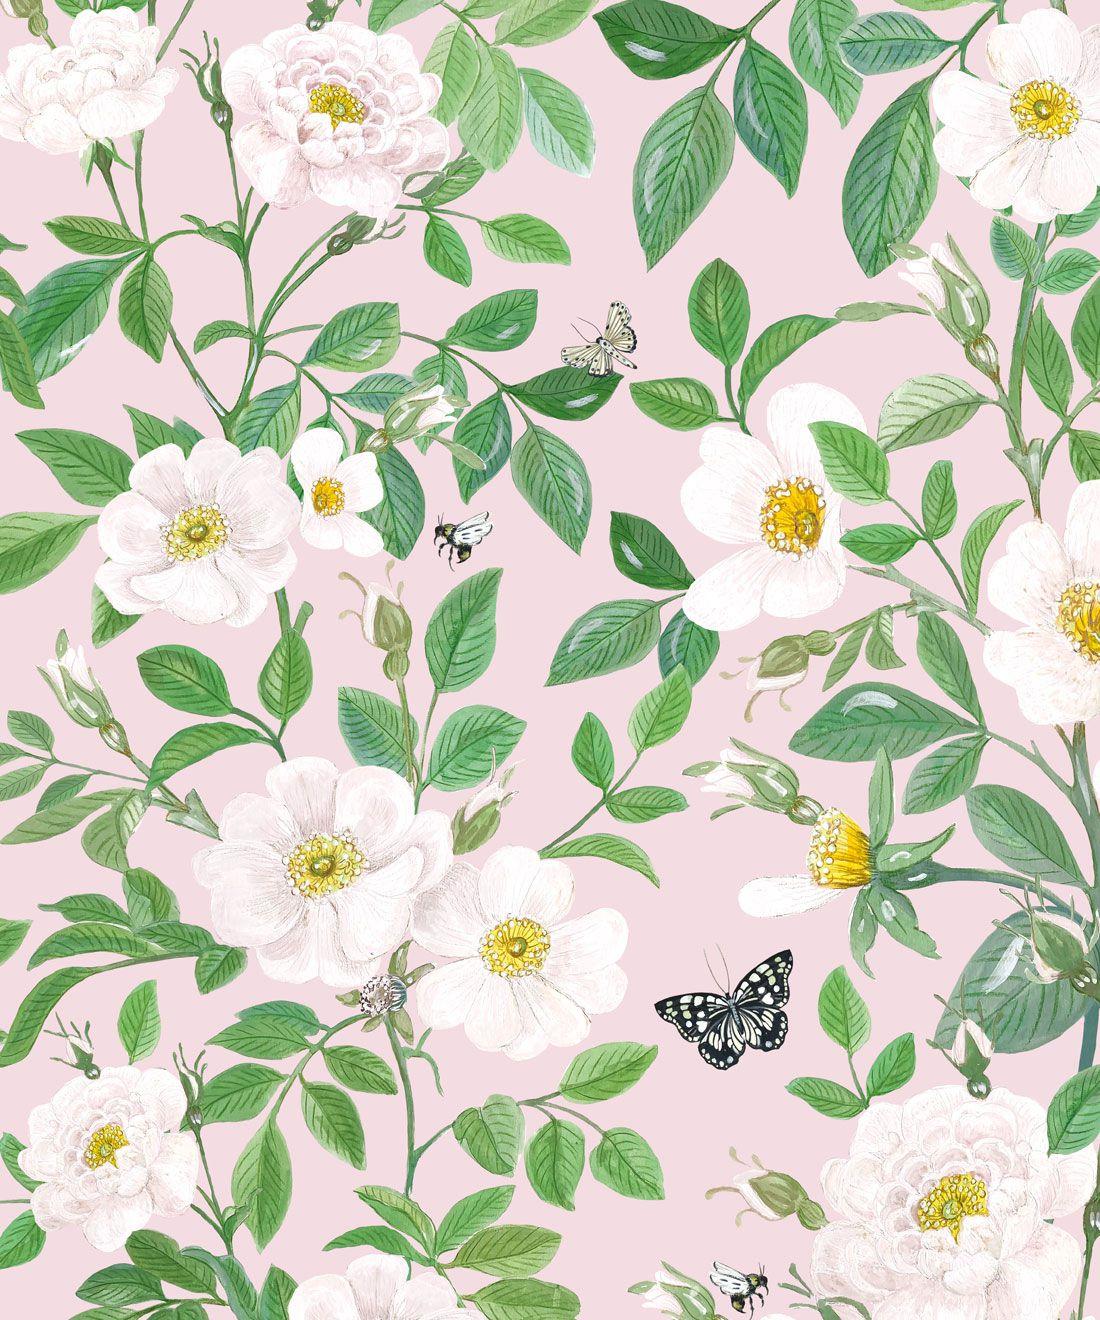 Rosa Wallpaper • Floral Wallpaper • Blush •Swatch